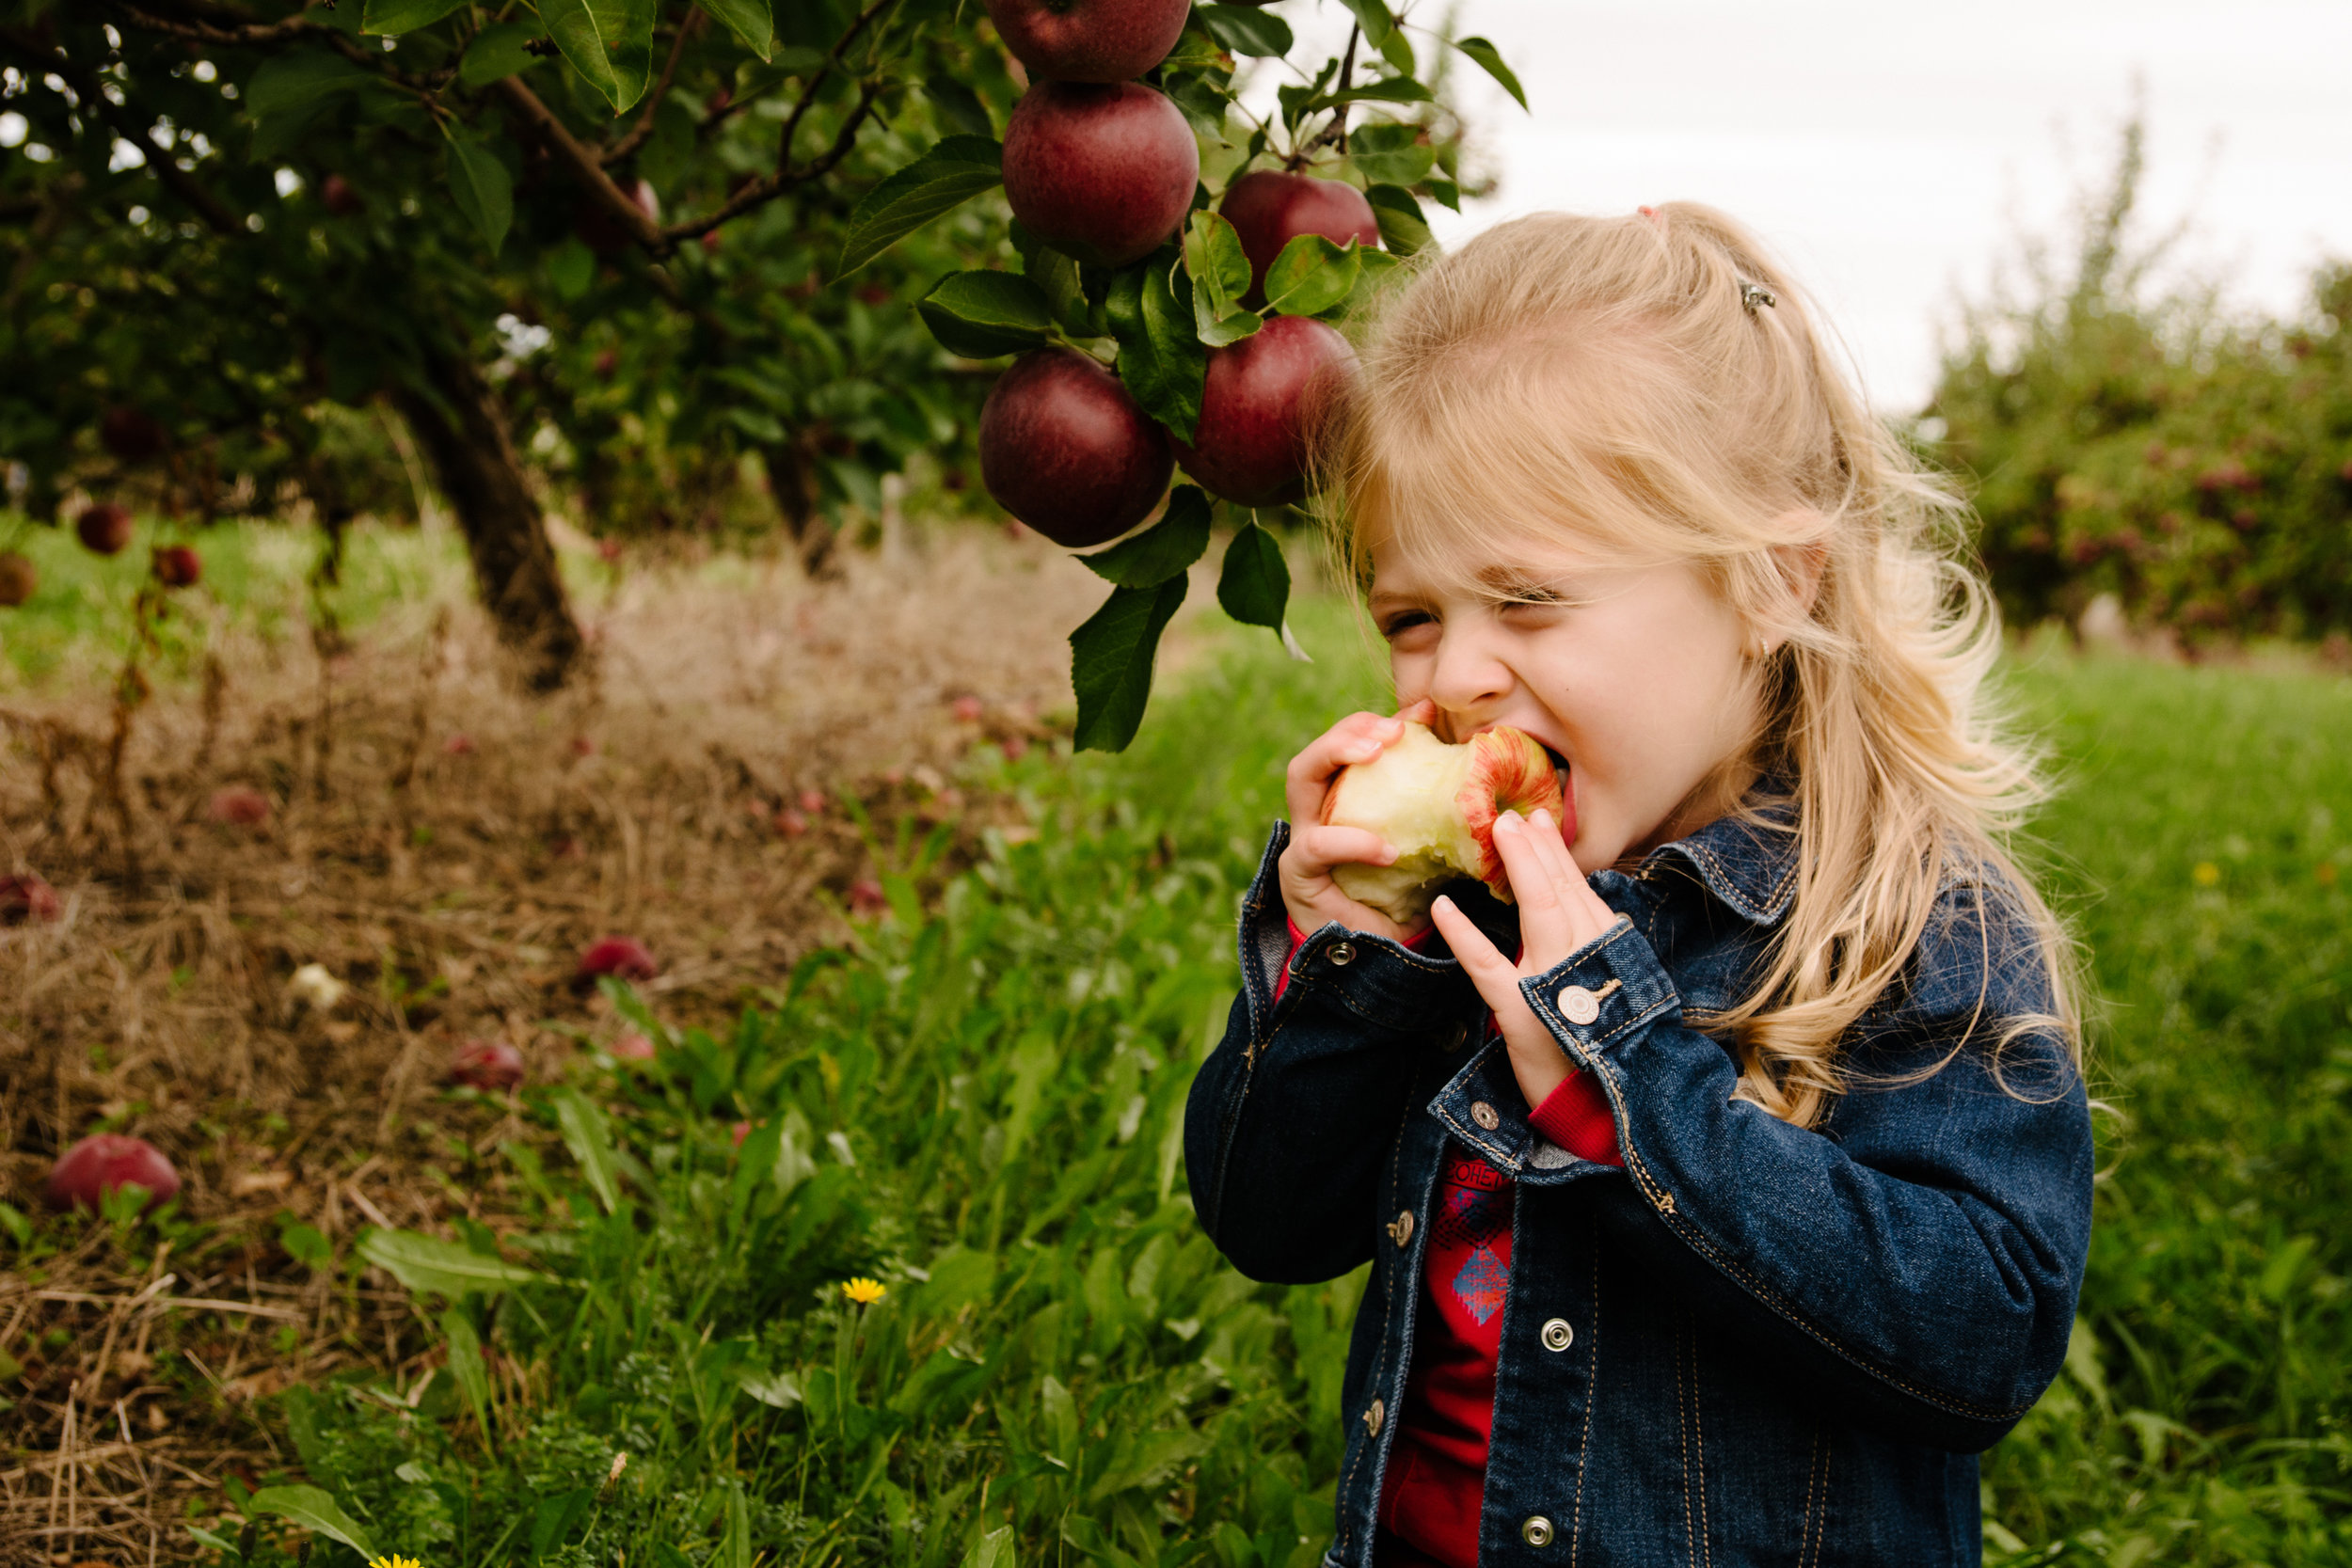 mini-seance-famille-elargie-aux-pommes-verger-des-bois-francs-plessisville-photographe-famille-victoriaville-montreal-25.jpg